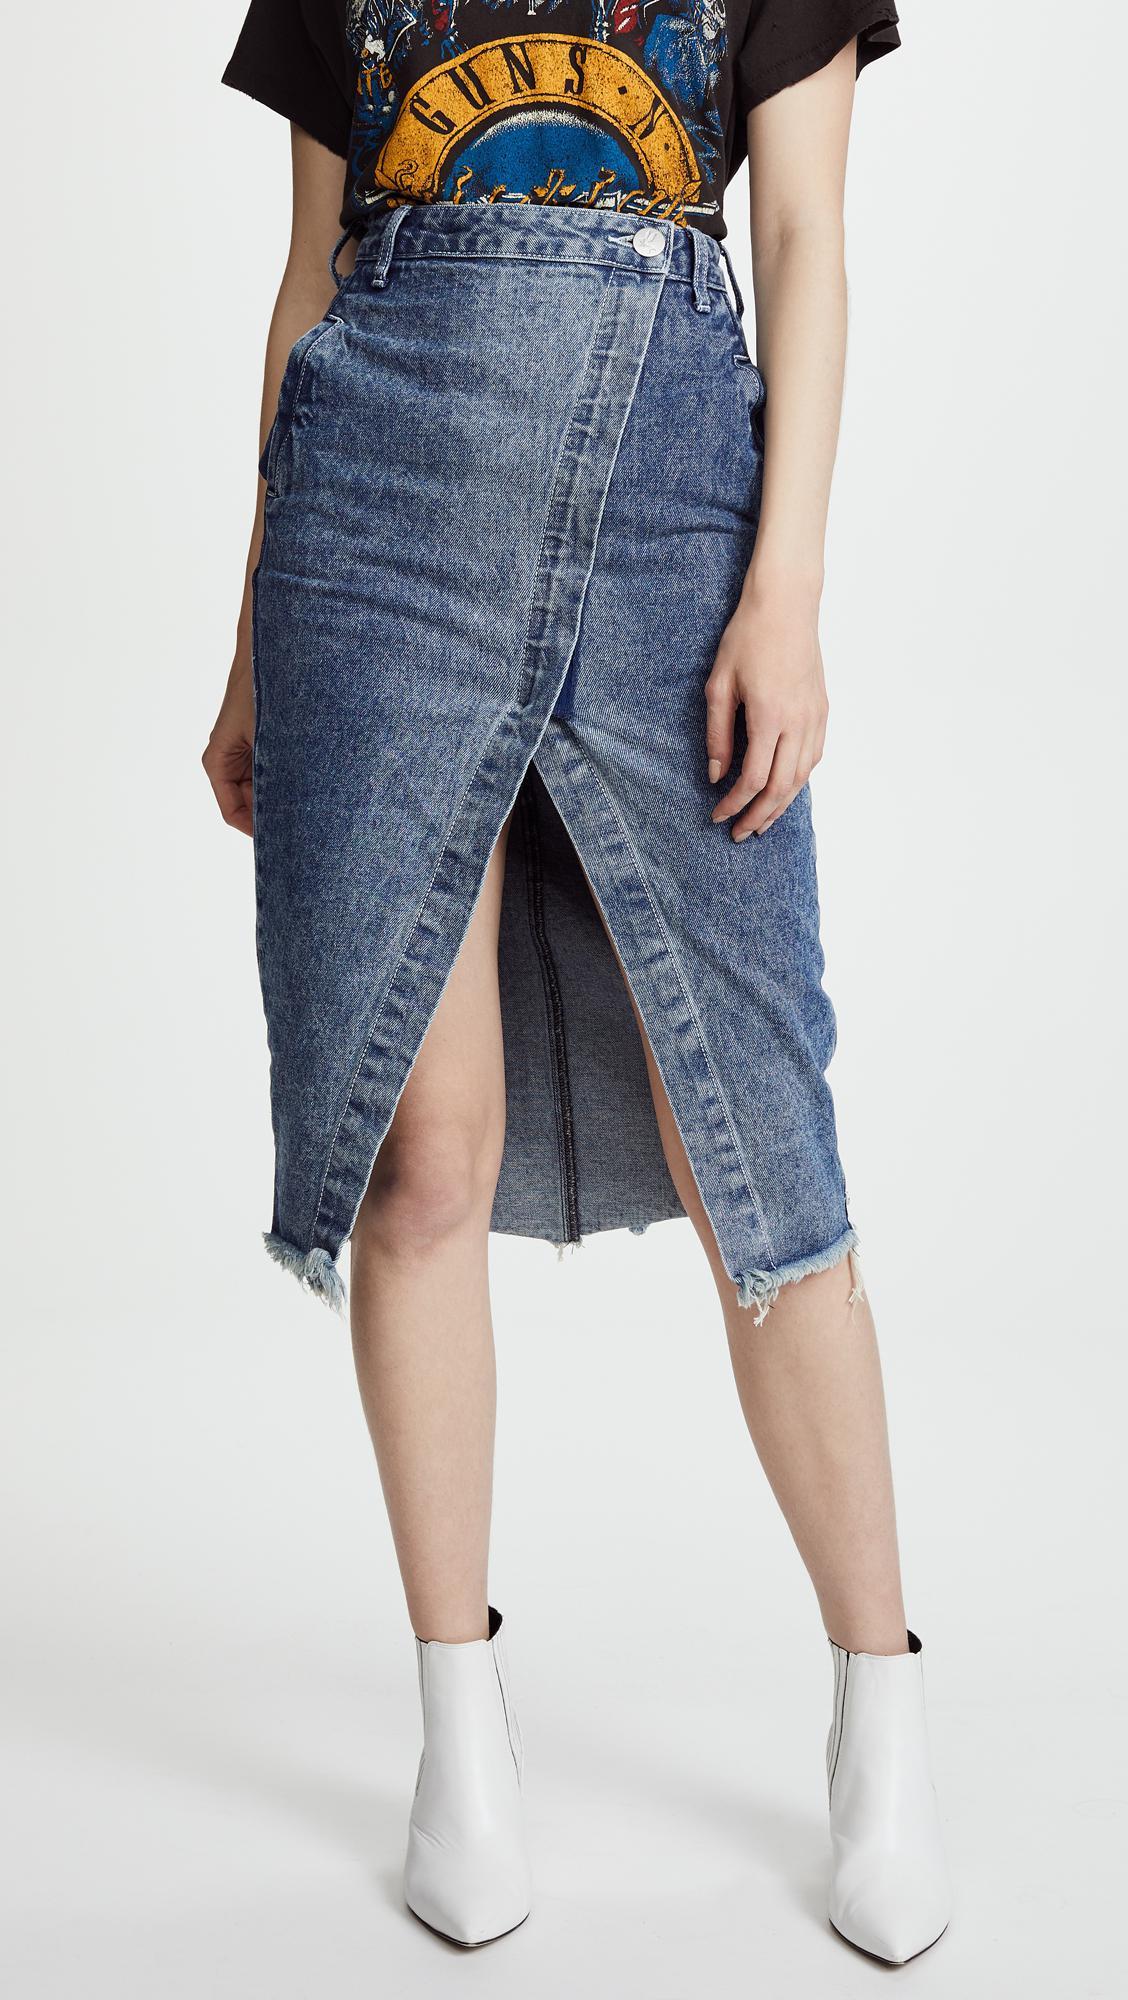 b1097aa88251 One Teaspoon Blue Society Wrap Denim Skirt in Blue - Lyst